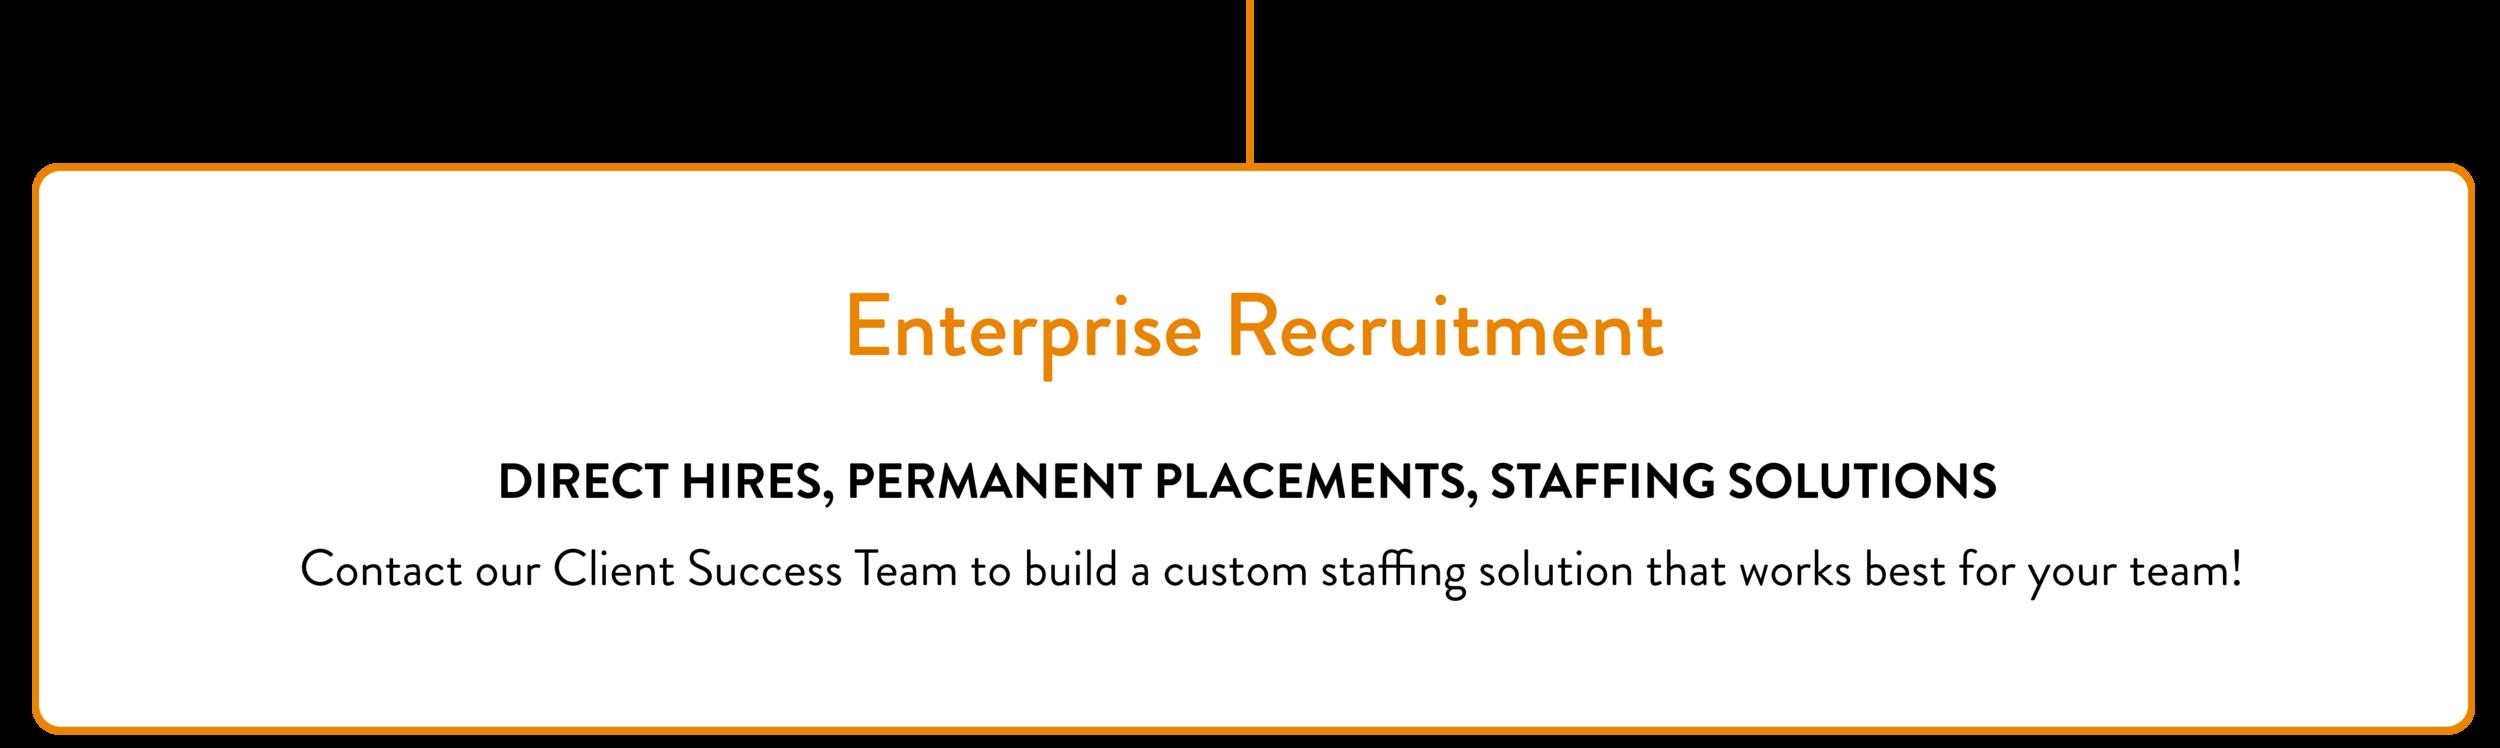 Enterprise Recruitment